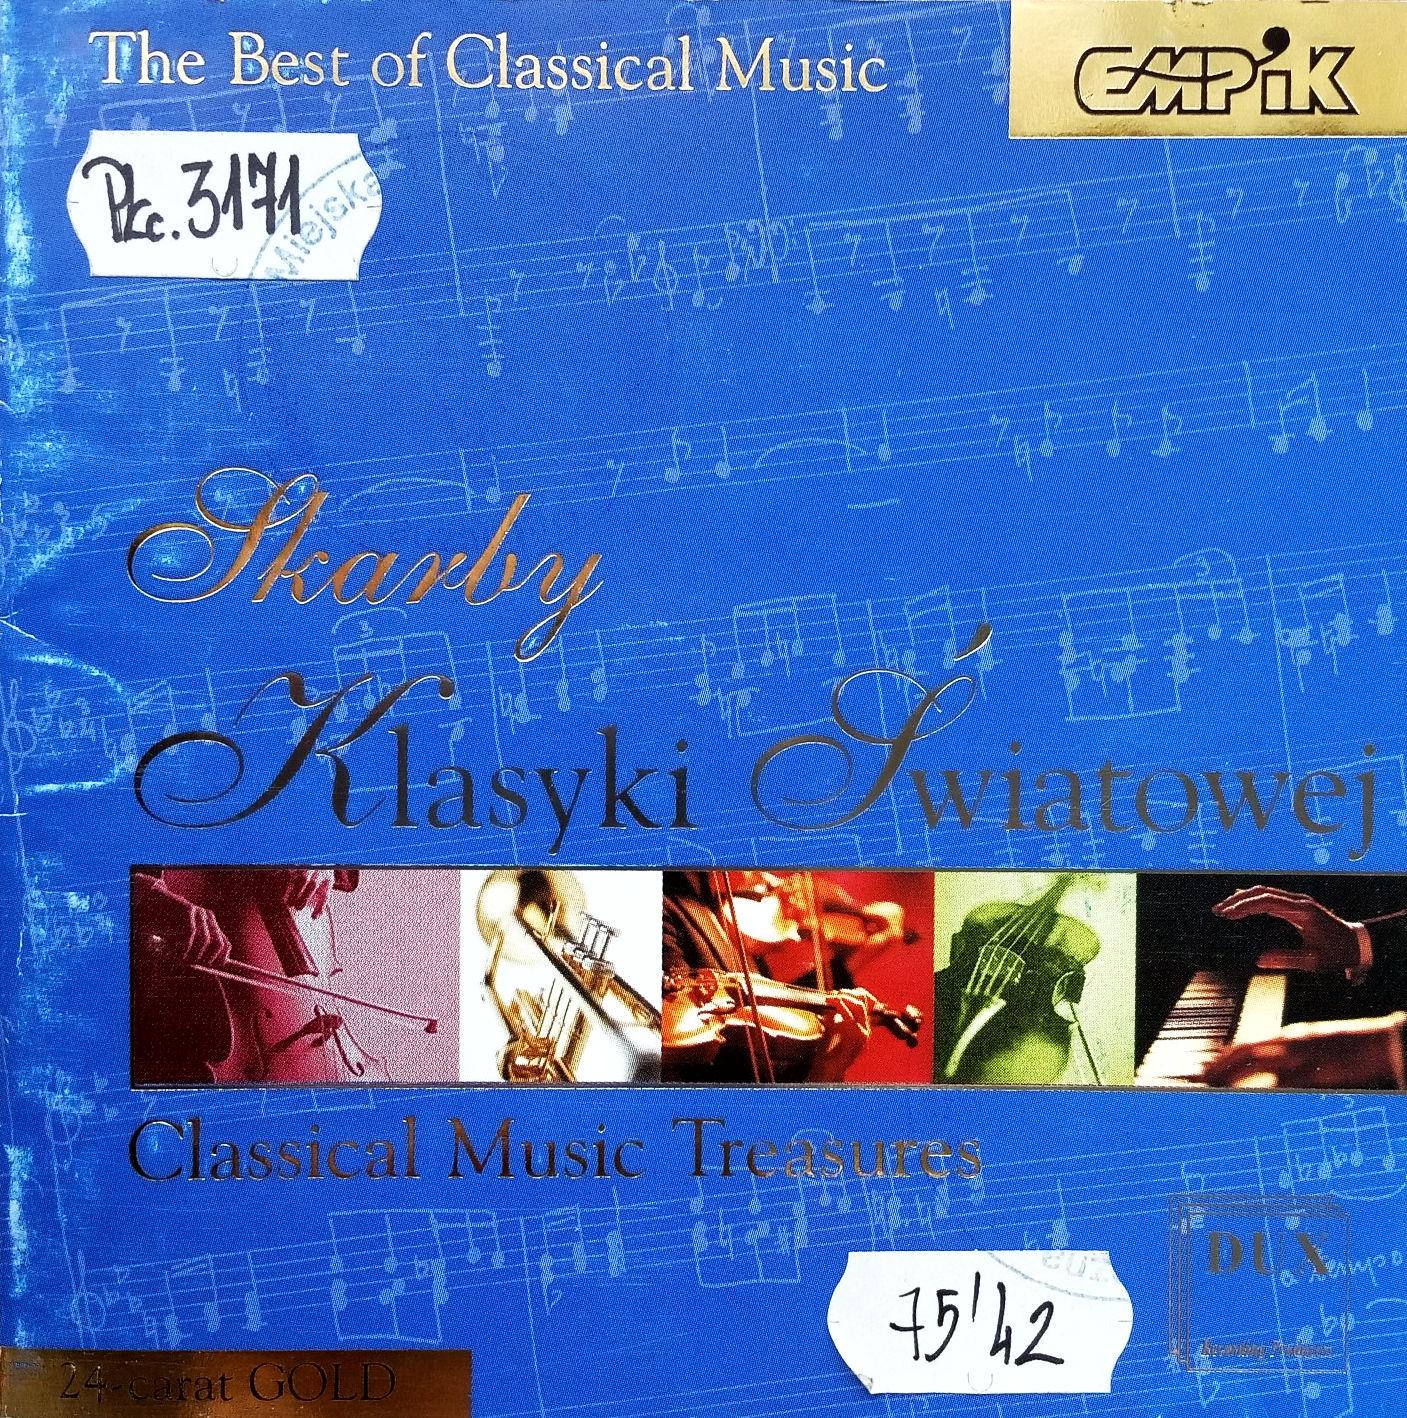 Skarby Klasyki Światowej – The Best Of Classical Music